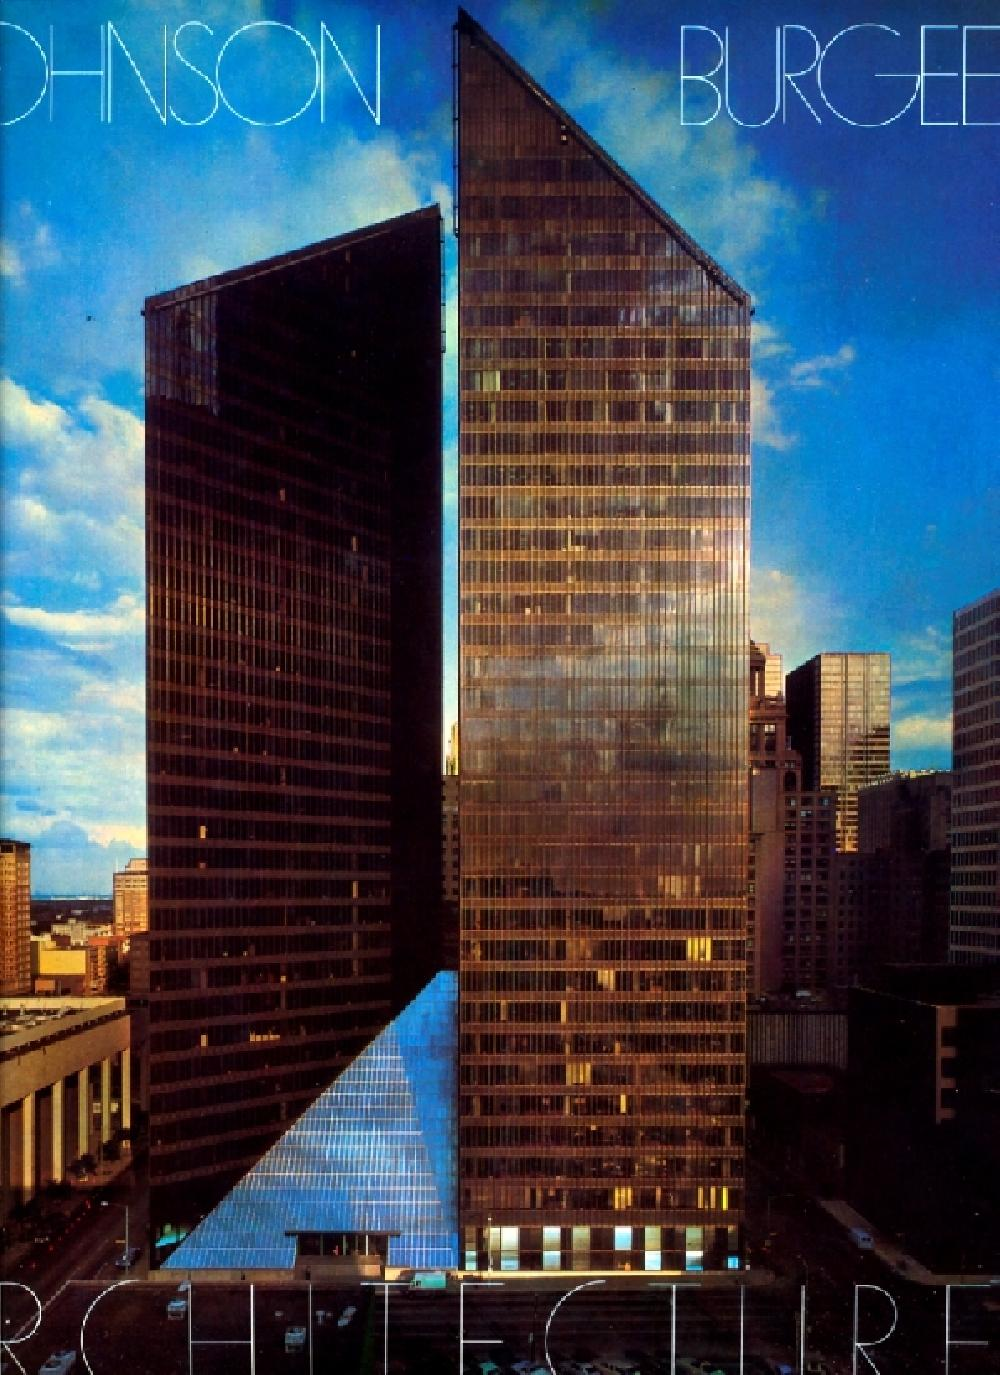 Johnson - Burgee Architecture